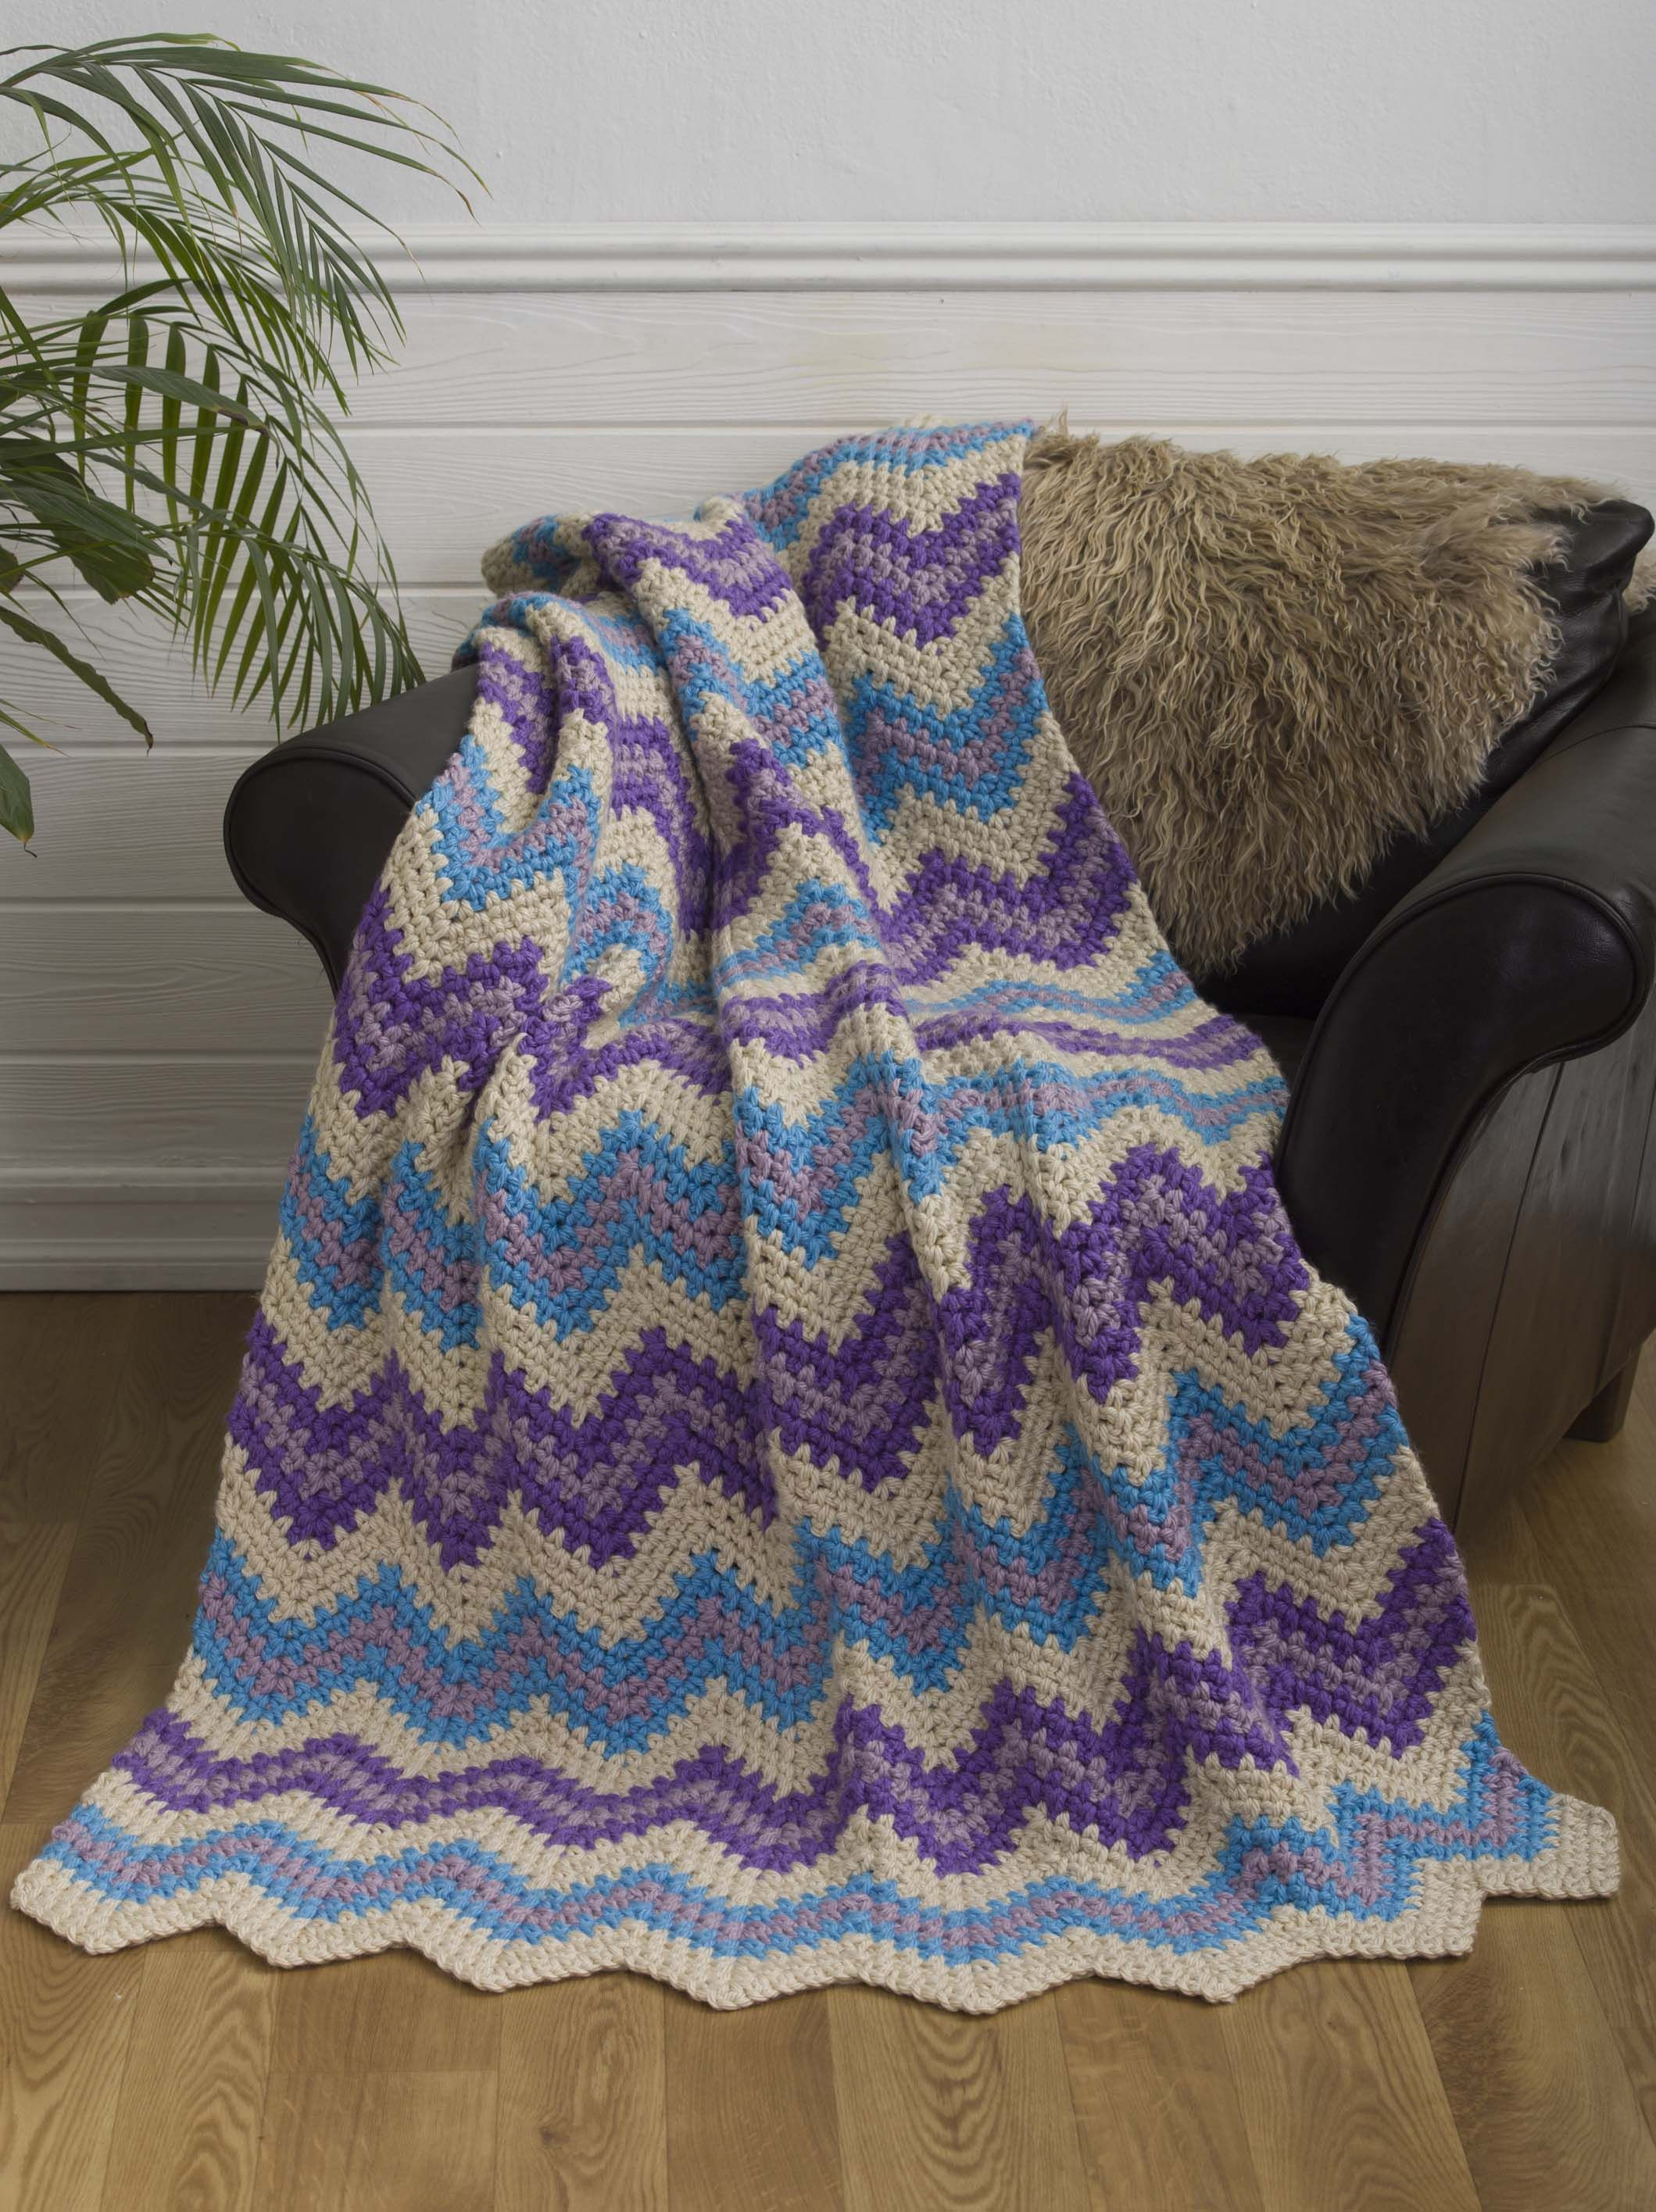 Super-Simple Chevron Throw Crochet 1-2-3 Issue #12 Designed by Margret Willson www.crochet1-2-3.com